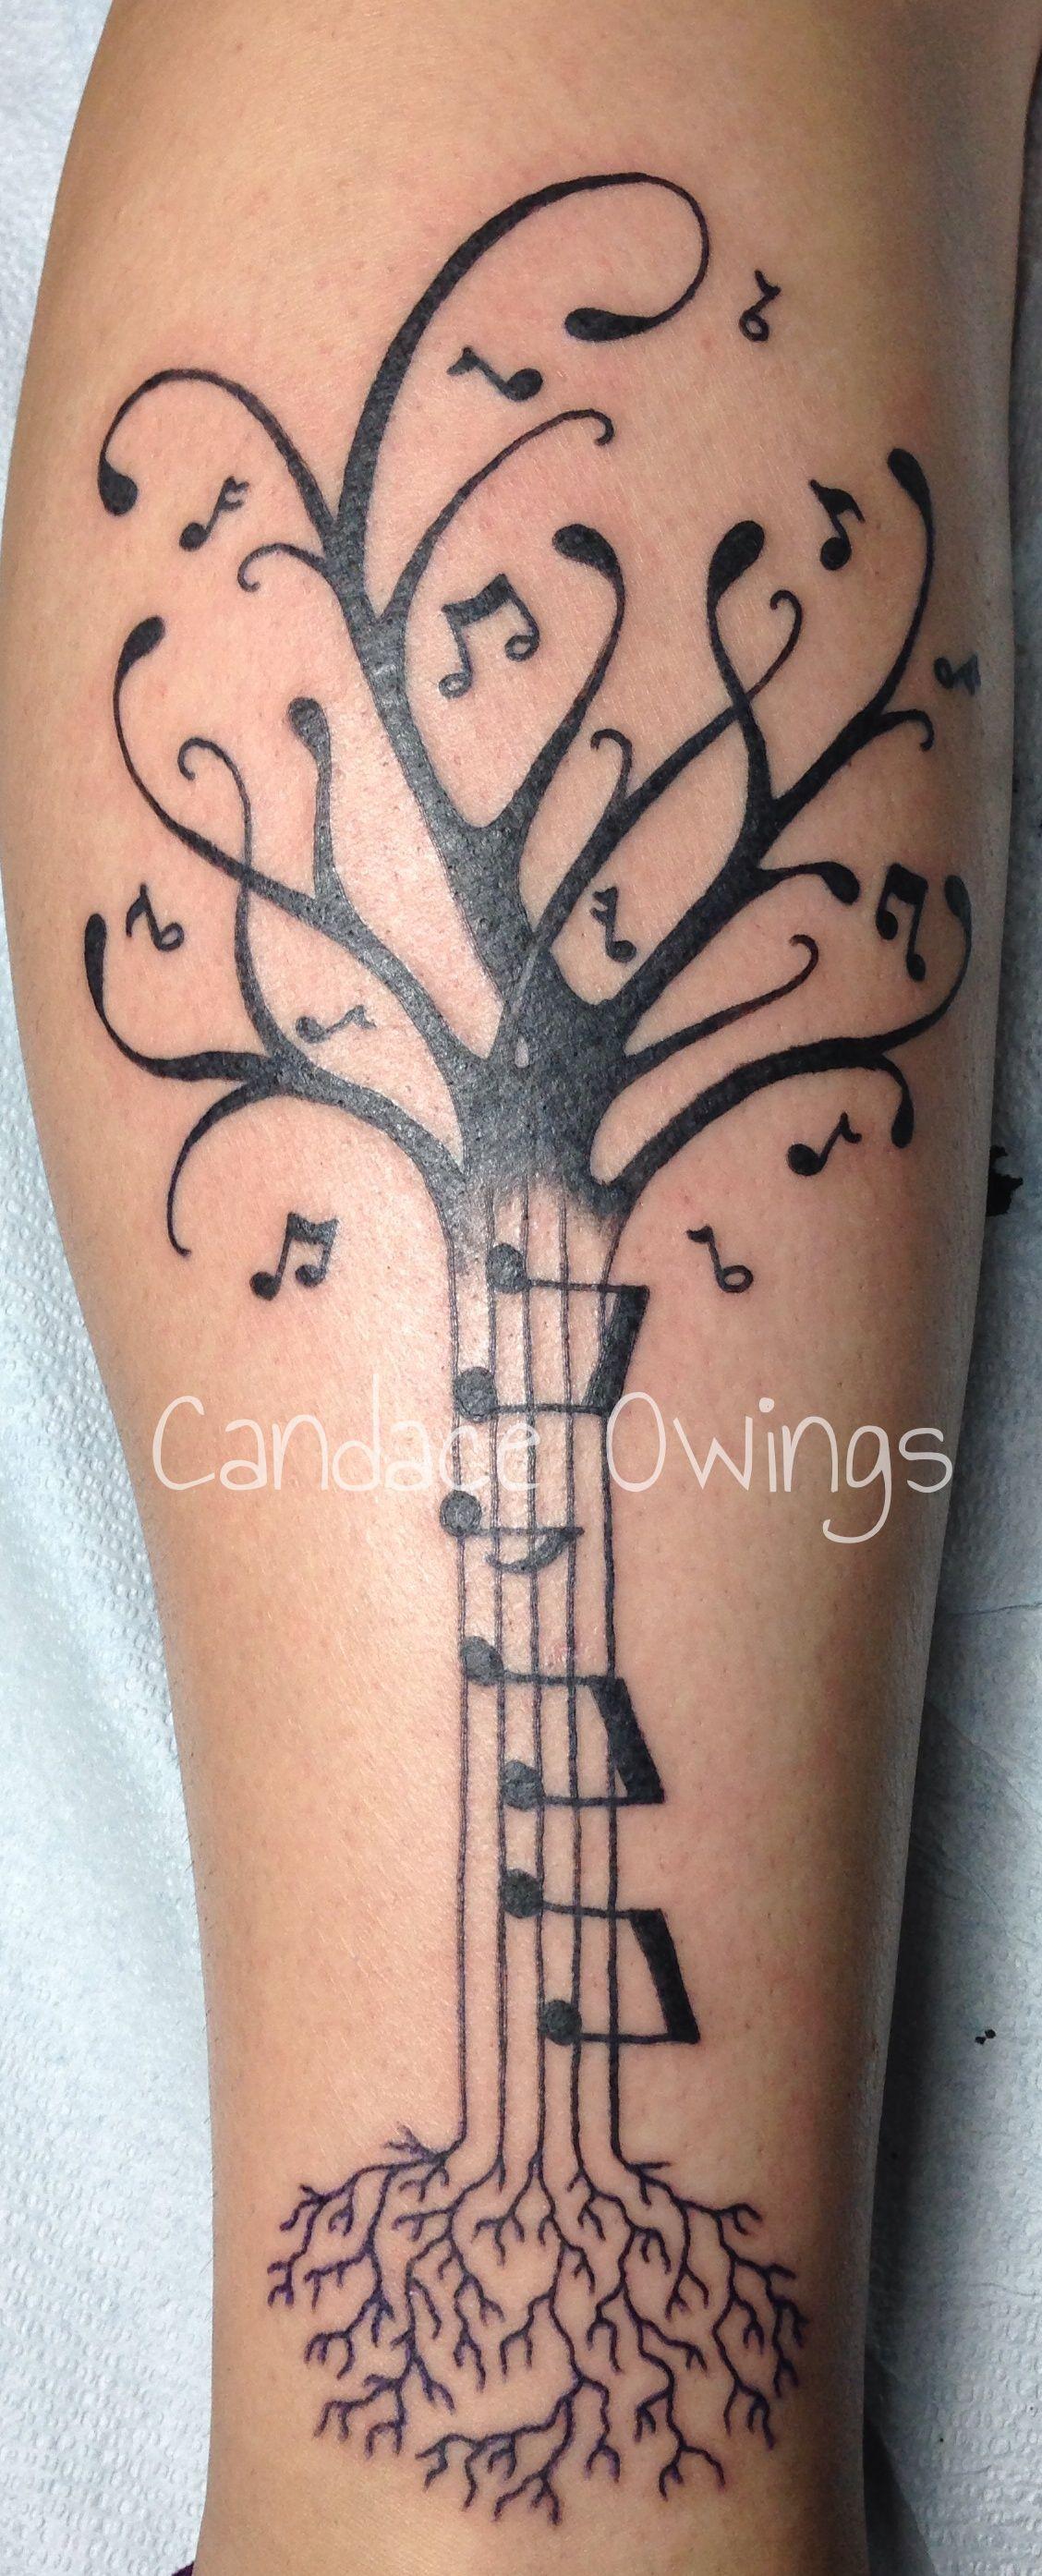 Pin By Awkward Potato On Future Tattoos Tatouage Tatouage Musique